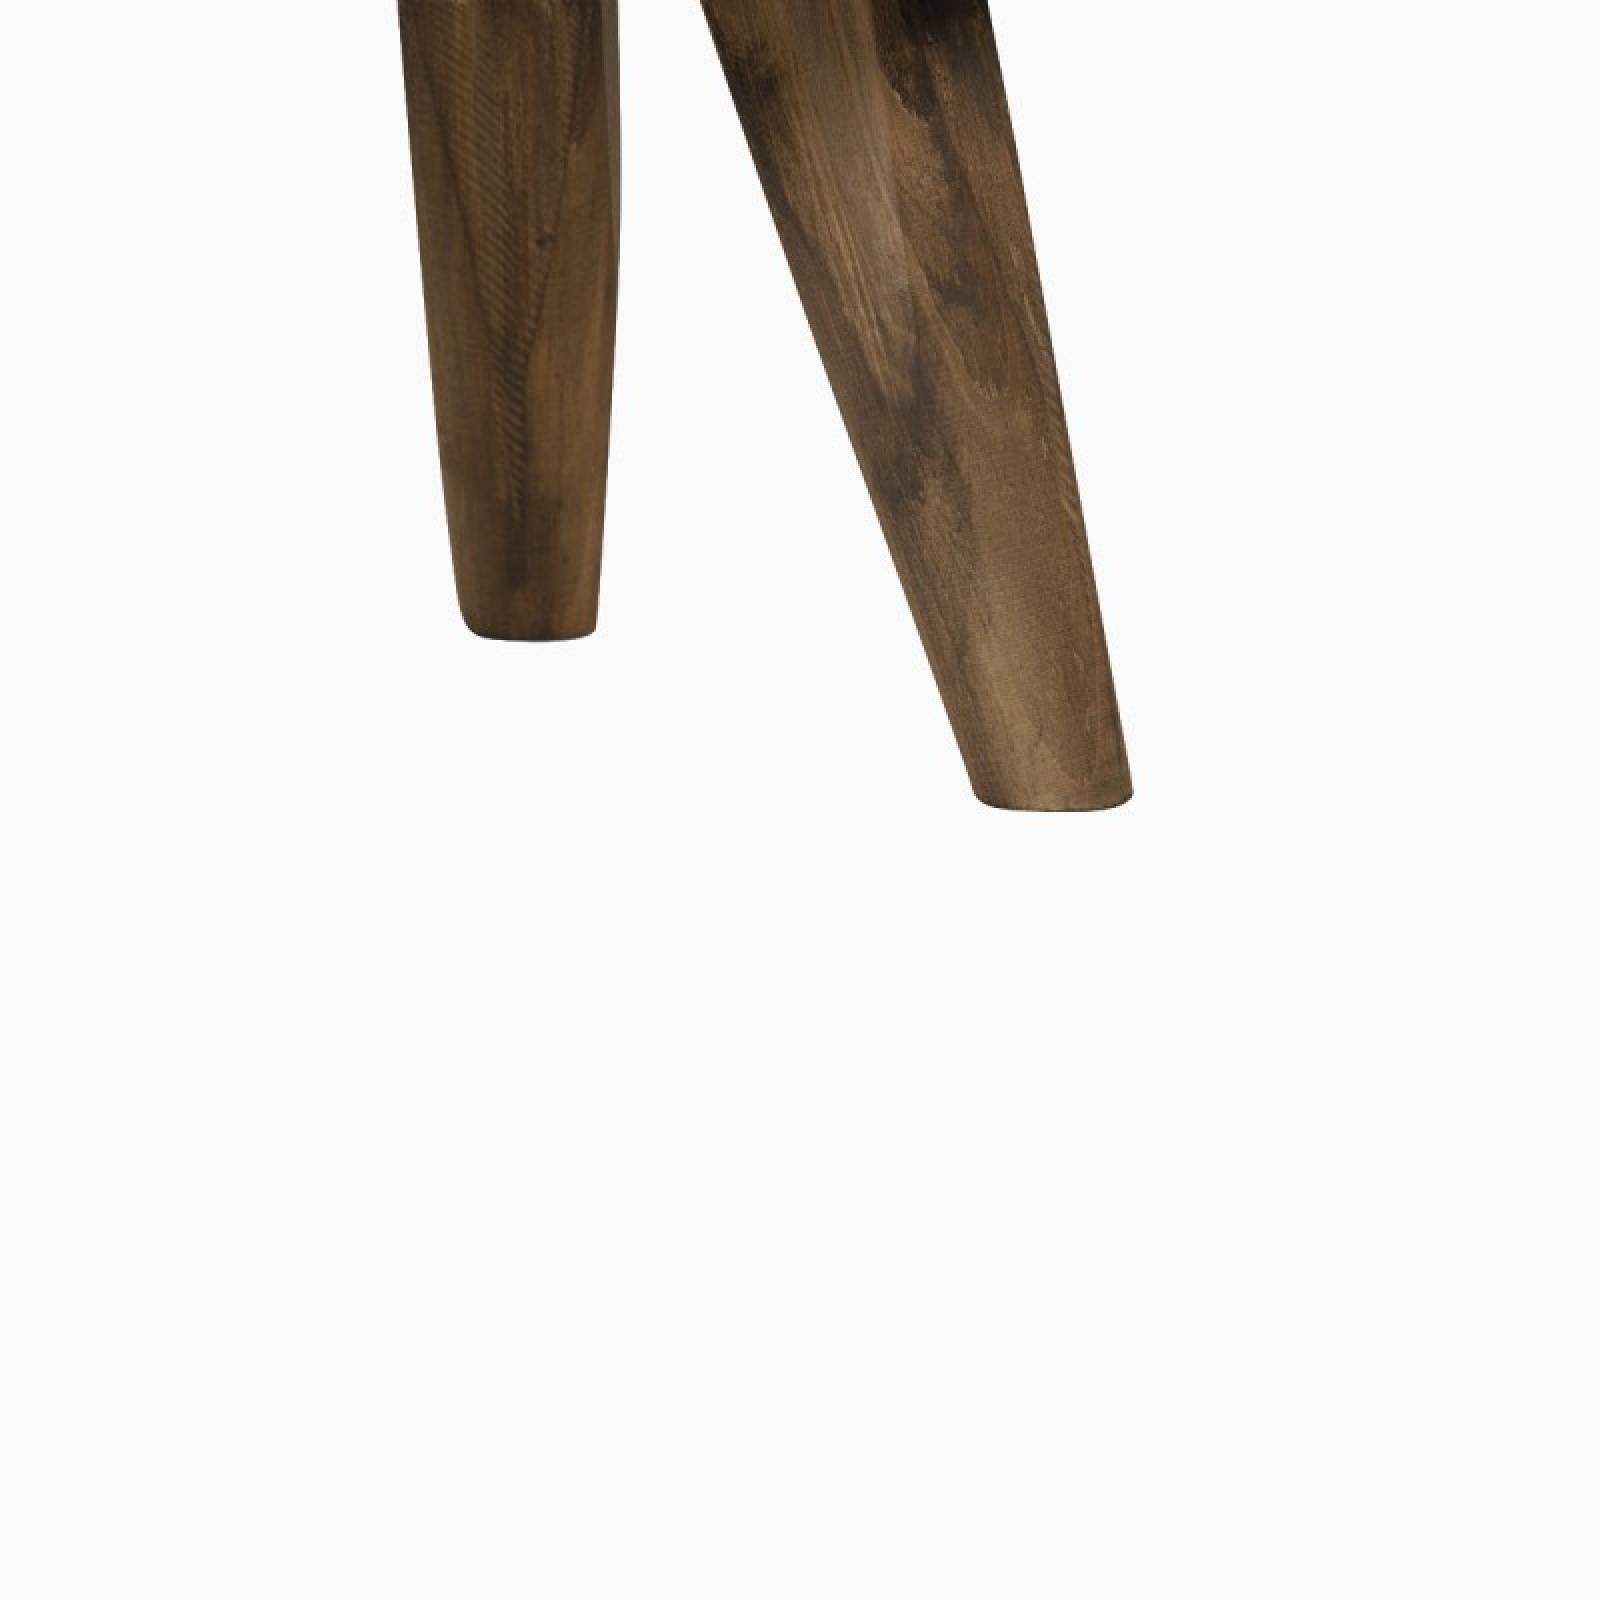 Canya Circular Woven Cane Side Table In Dark thumbnails